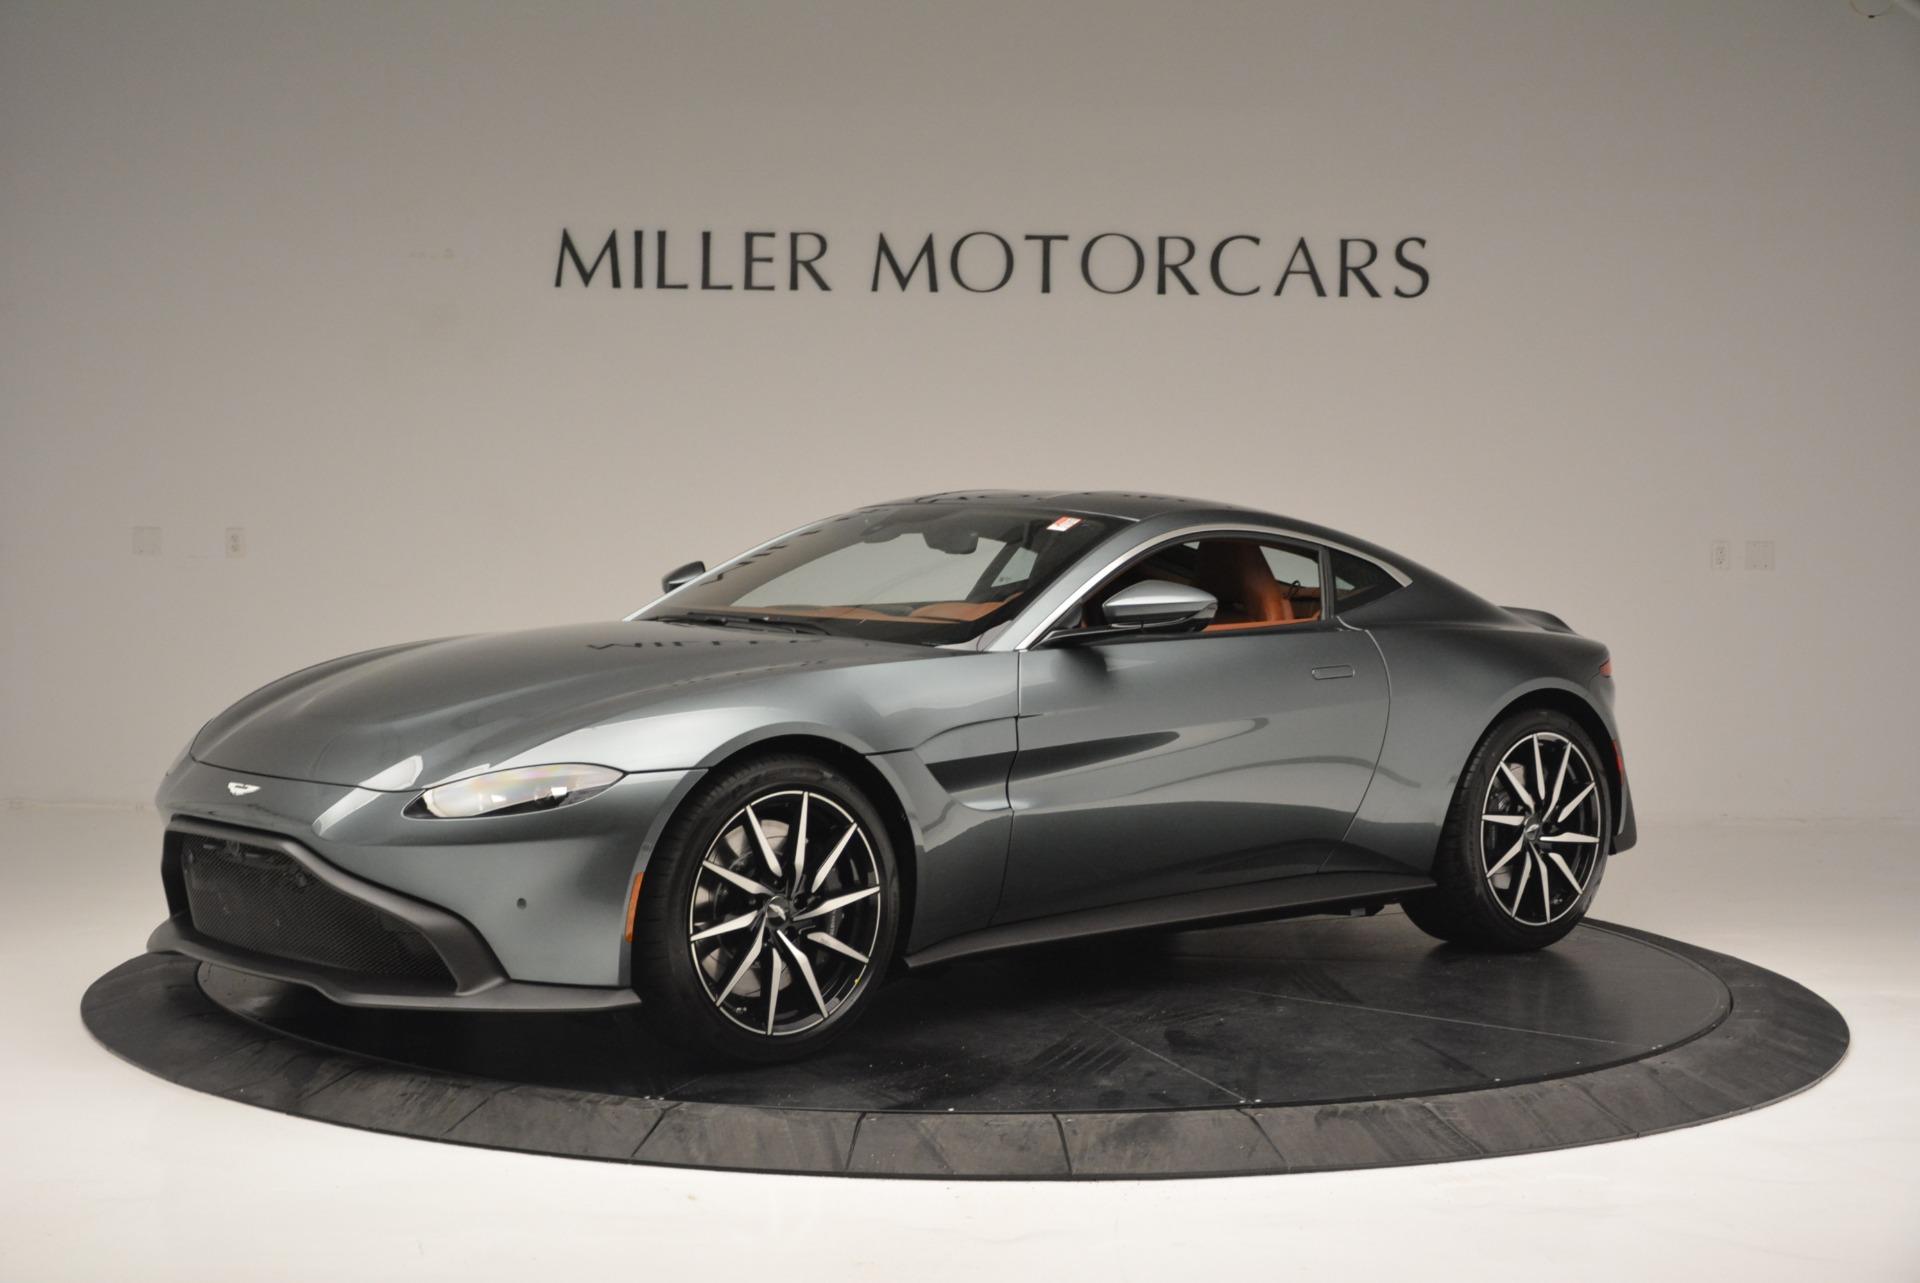 Aston Martin Lease Specials Miller Motorcars New Aston Martin - How much is aston martin